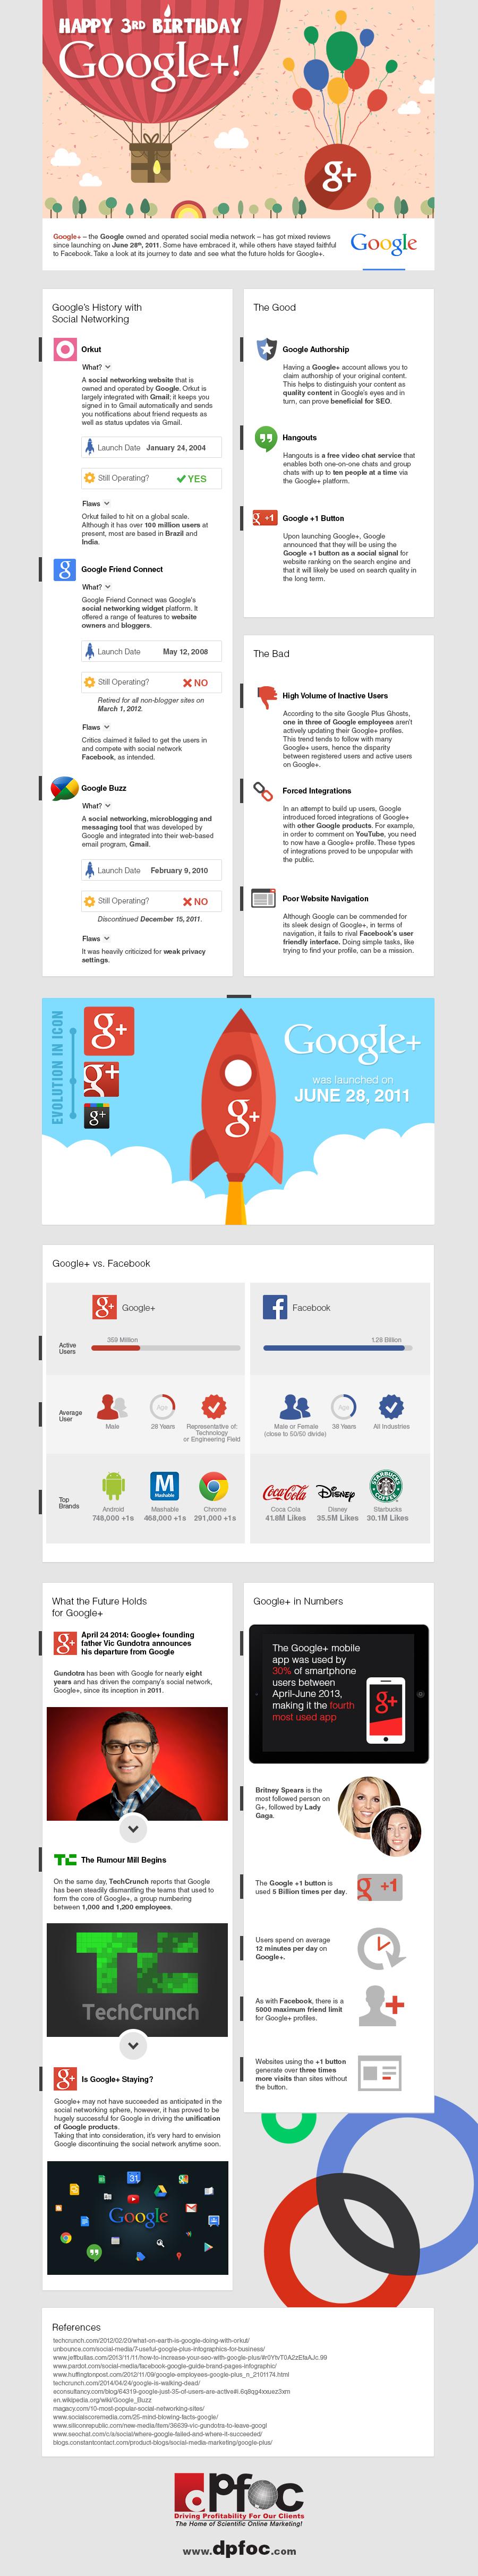 Happy 3rd Birthday Google Plus [images: DPFOC]